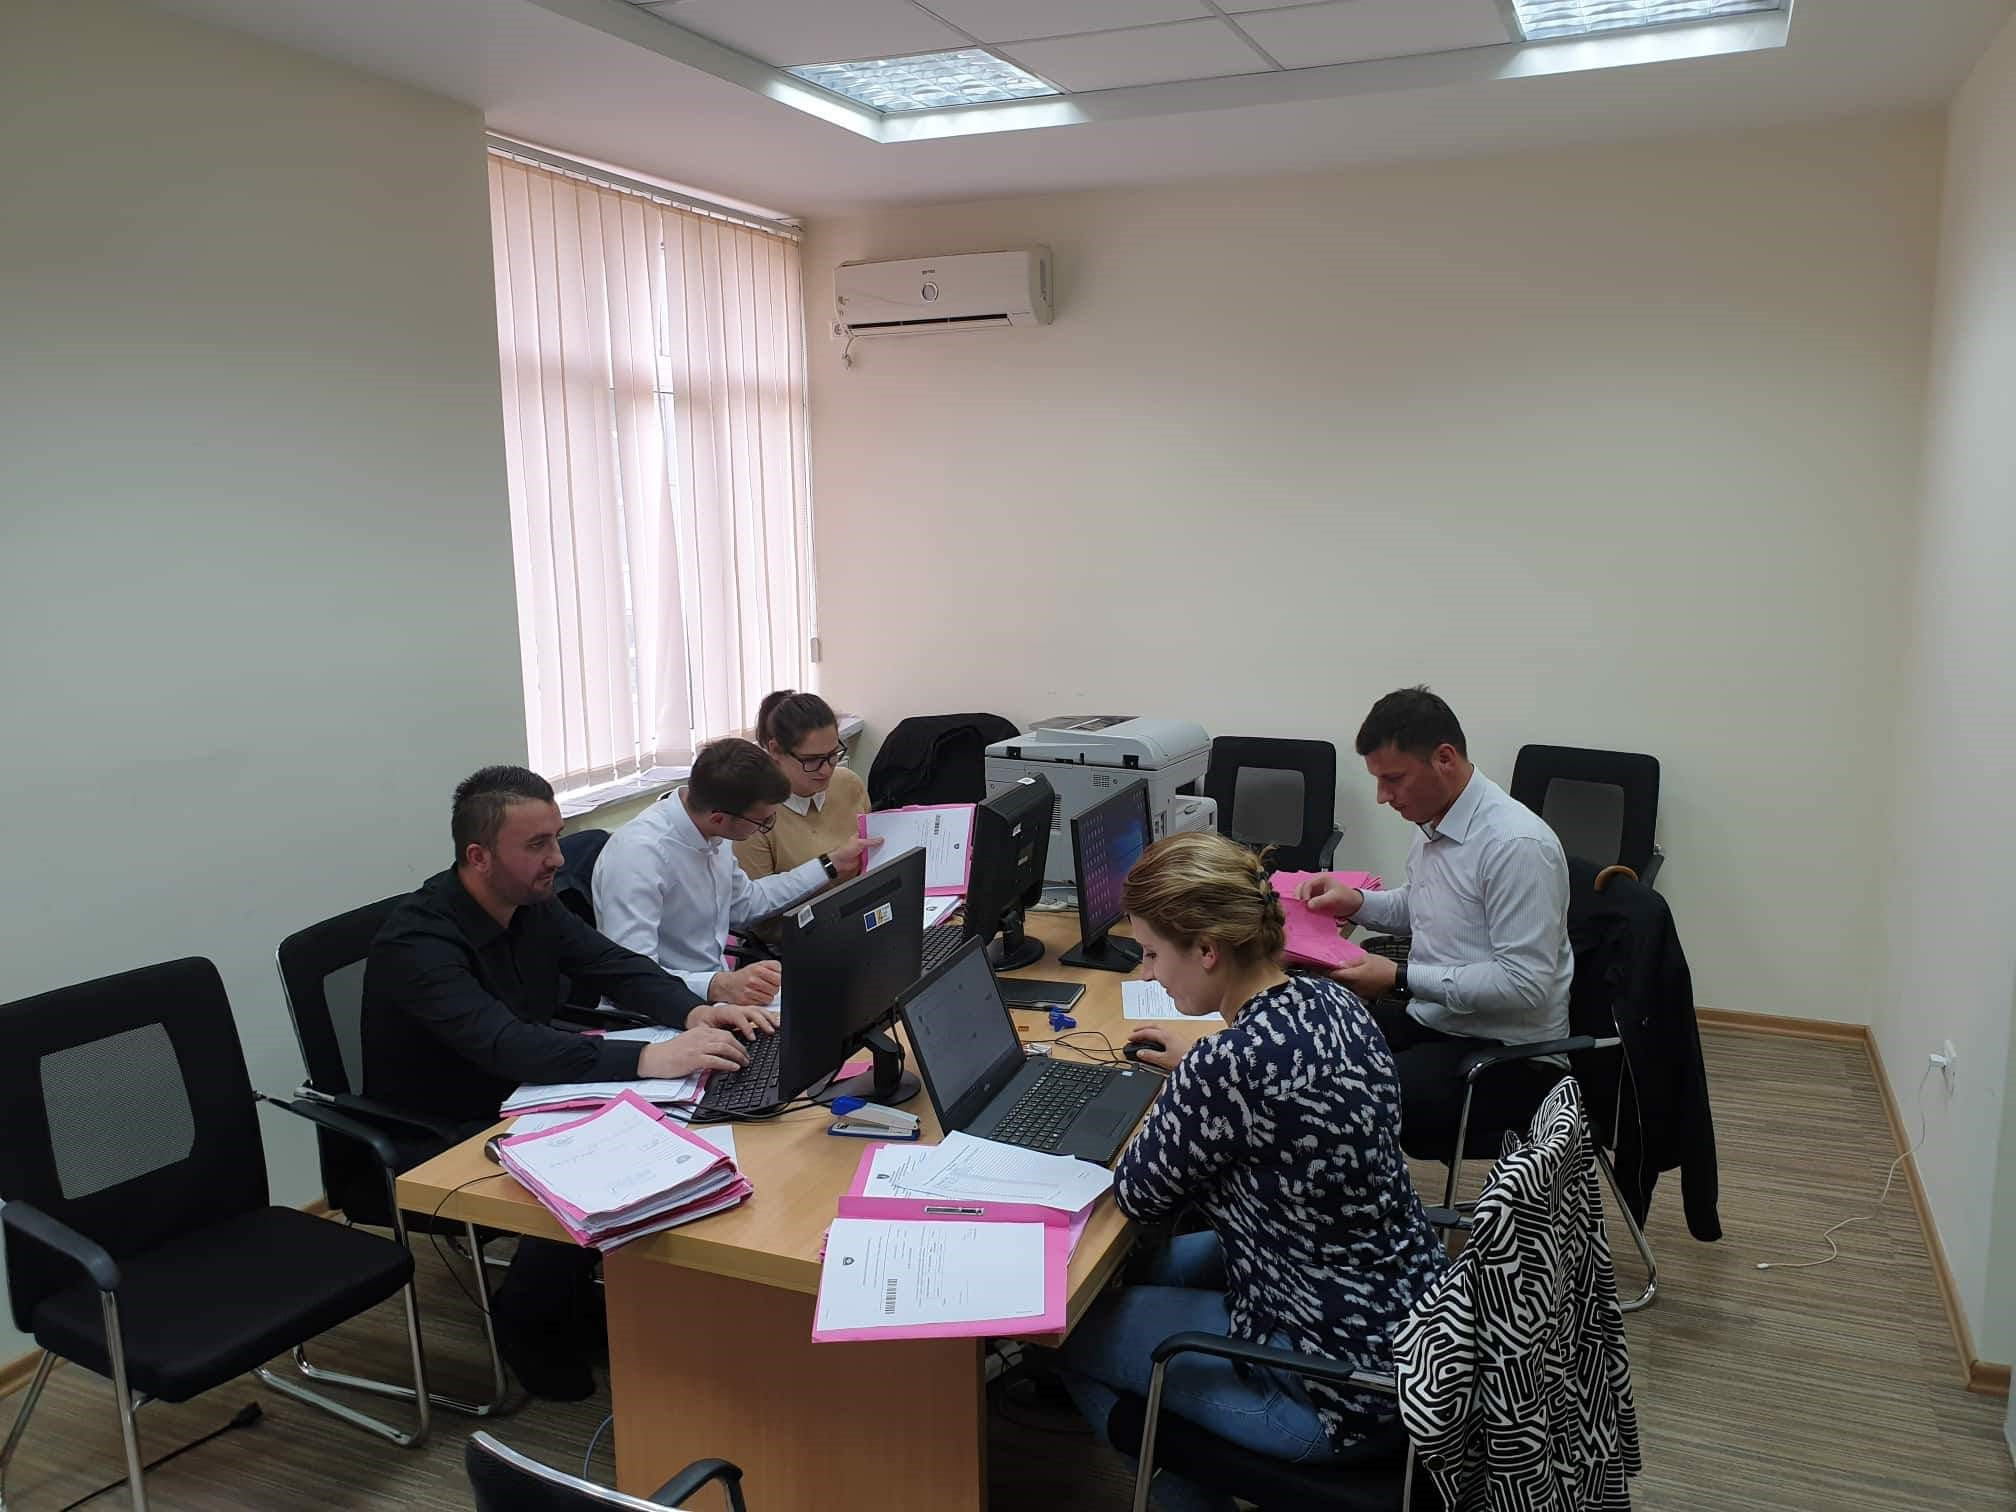 Basic Court of Pristina – Lipjan Branch completed the registration of criminal backlog cases in the CMIS system